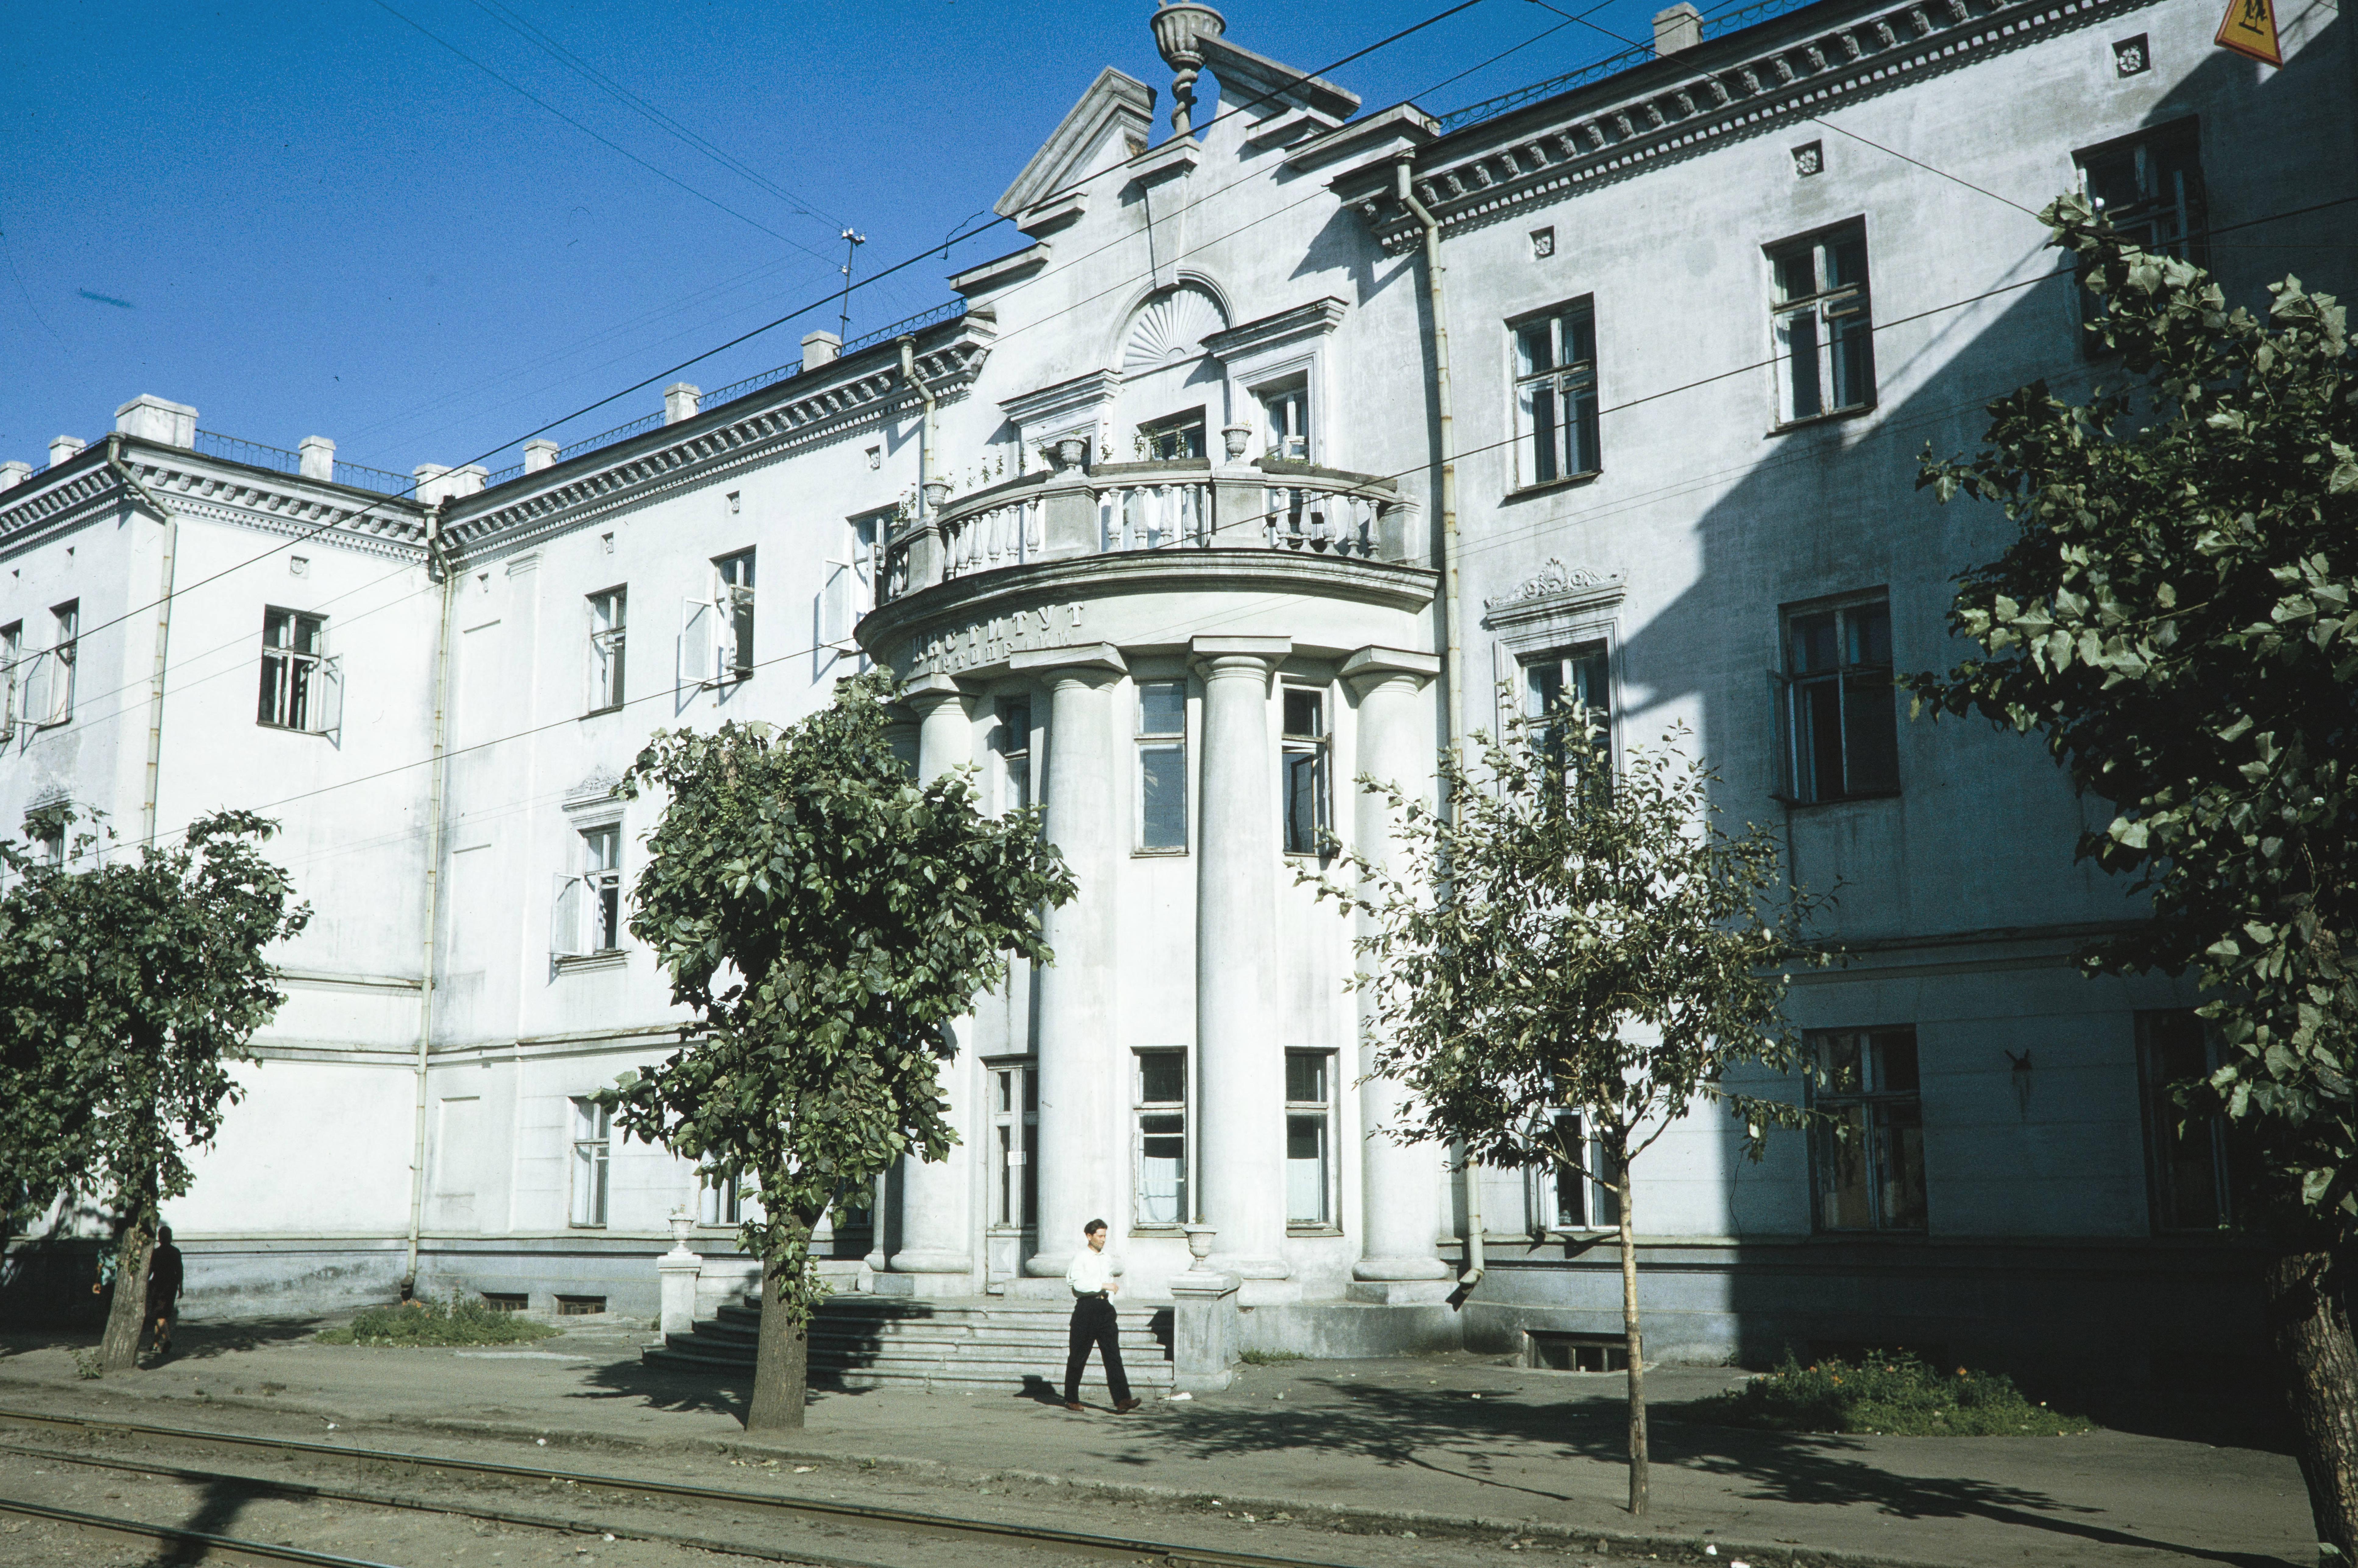 Улица Тимирязева, 7. Институт Ортопедии